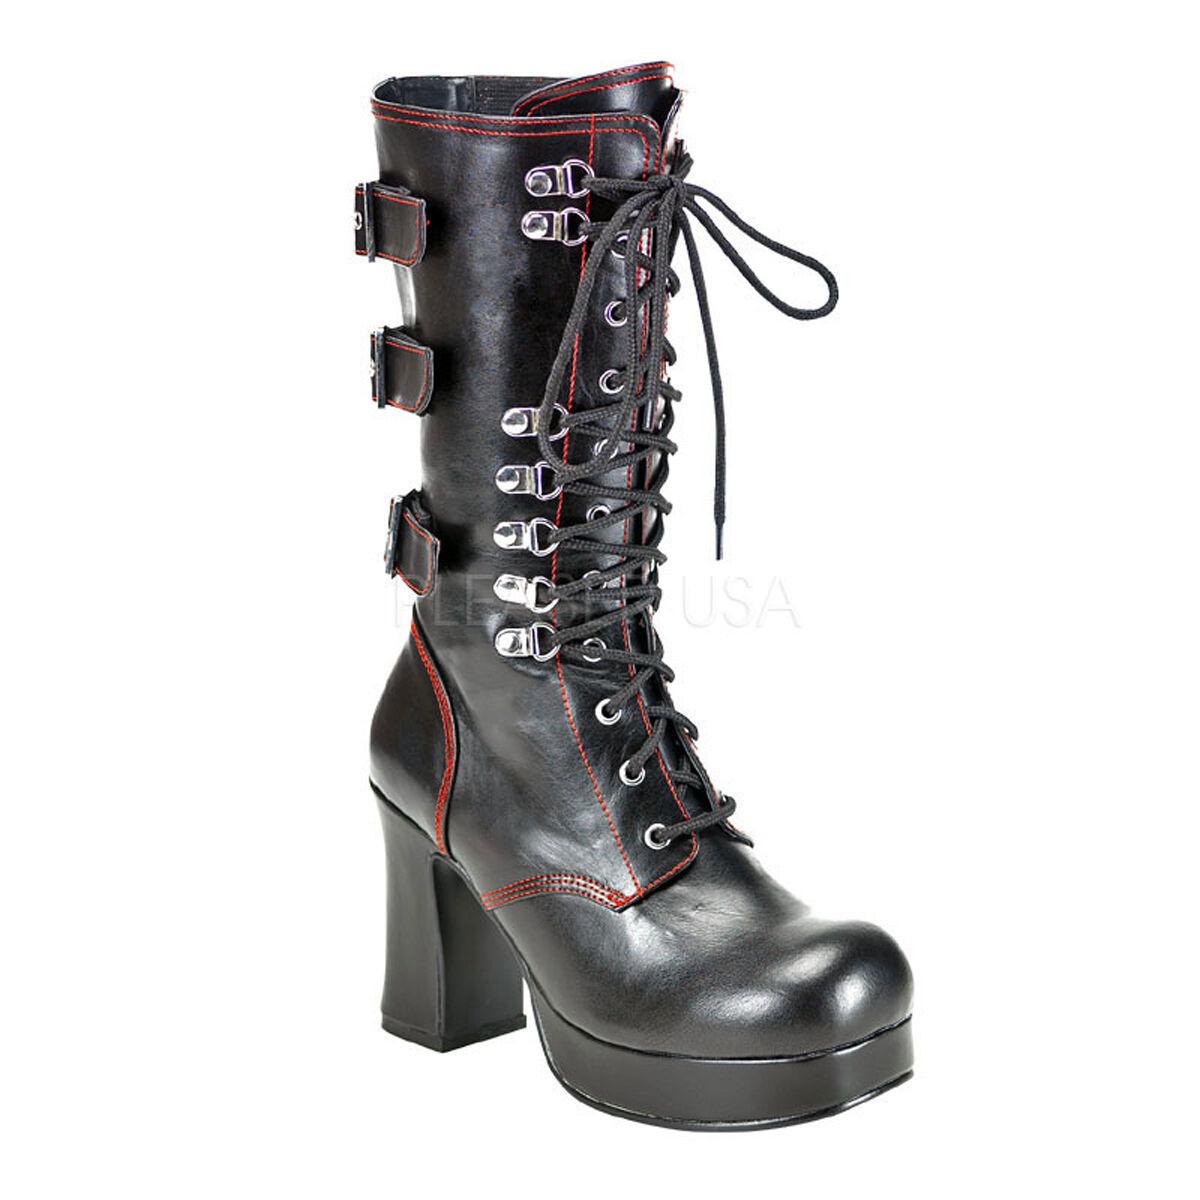 DEMONIA GOT101/B/PU Women's Black Gothic Platform Buckle Chunky Heel Calf Boots